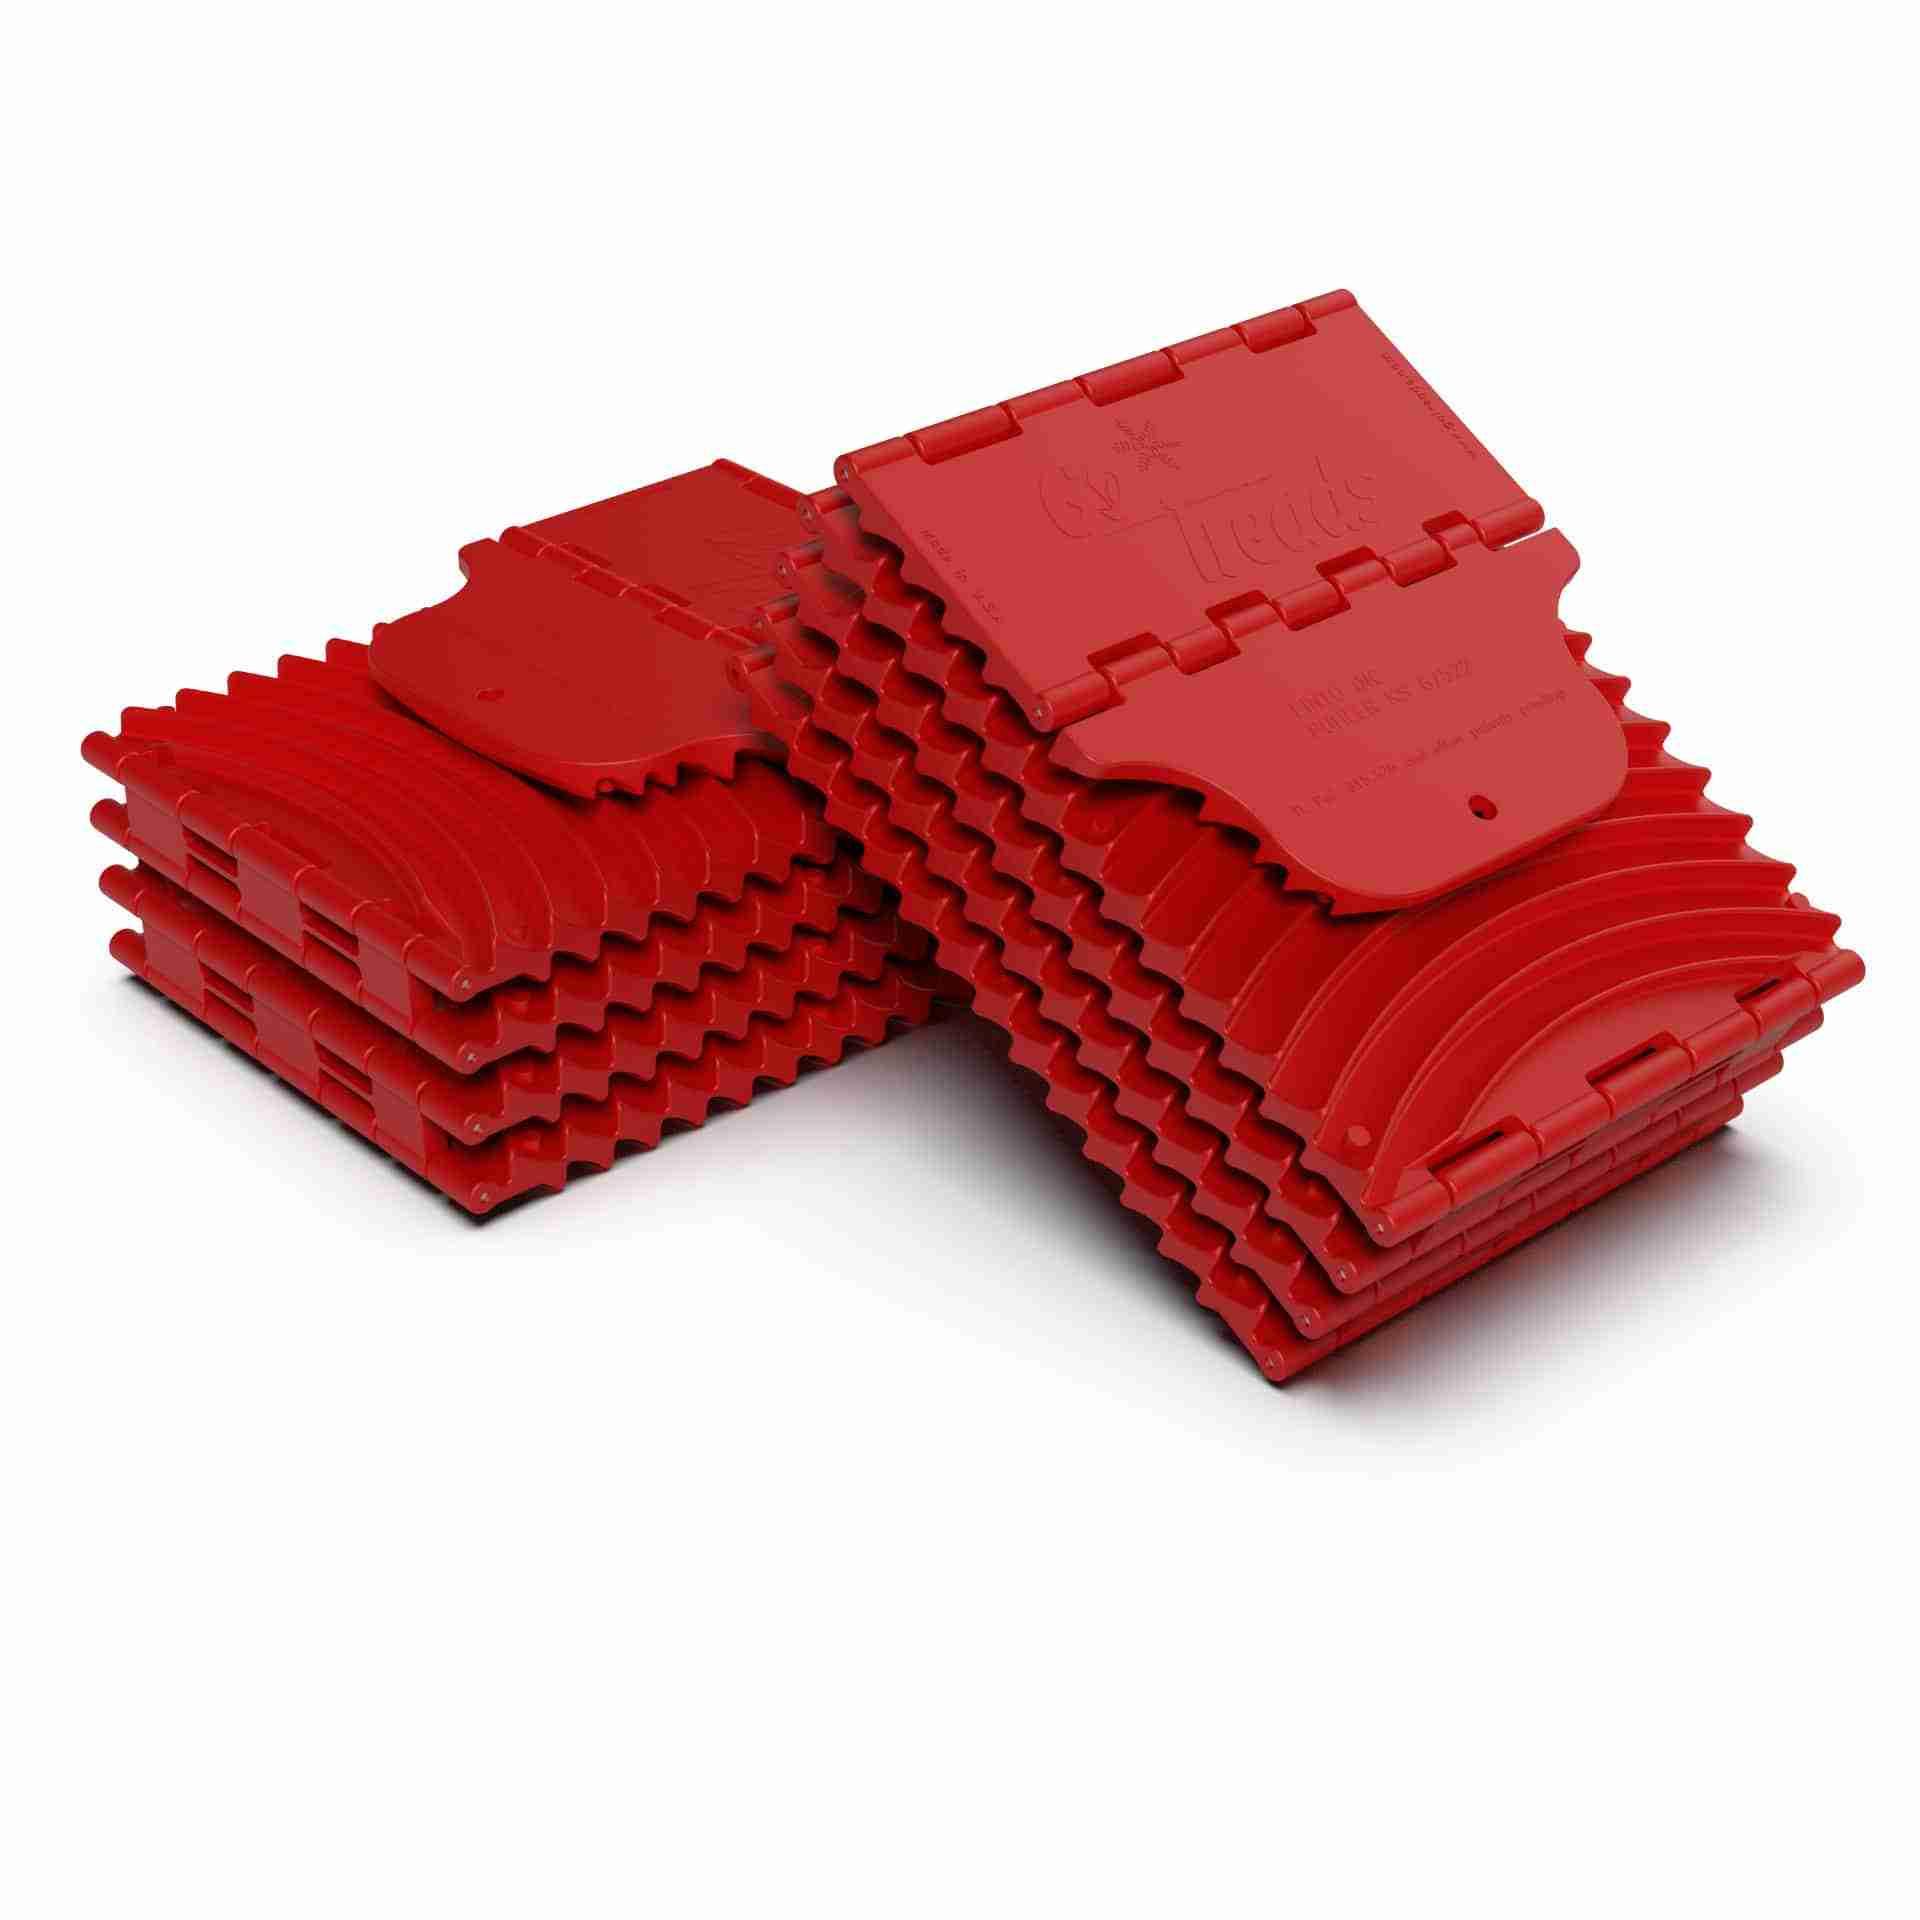 GoTreads XL Red Folded